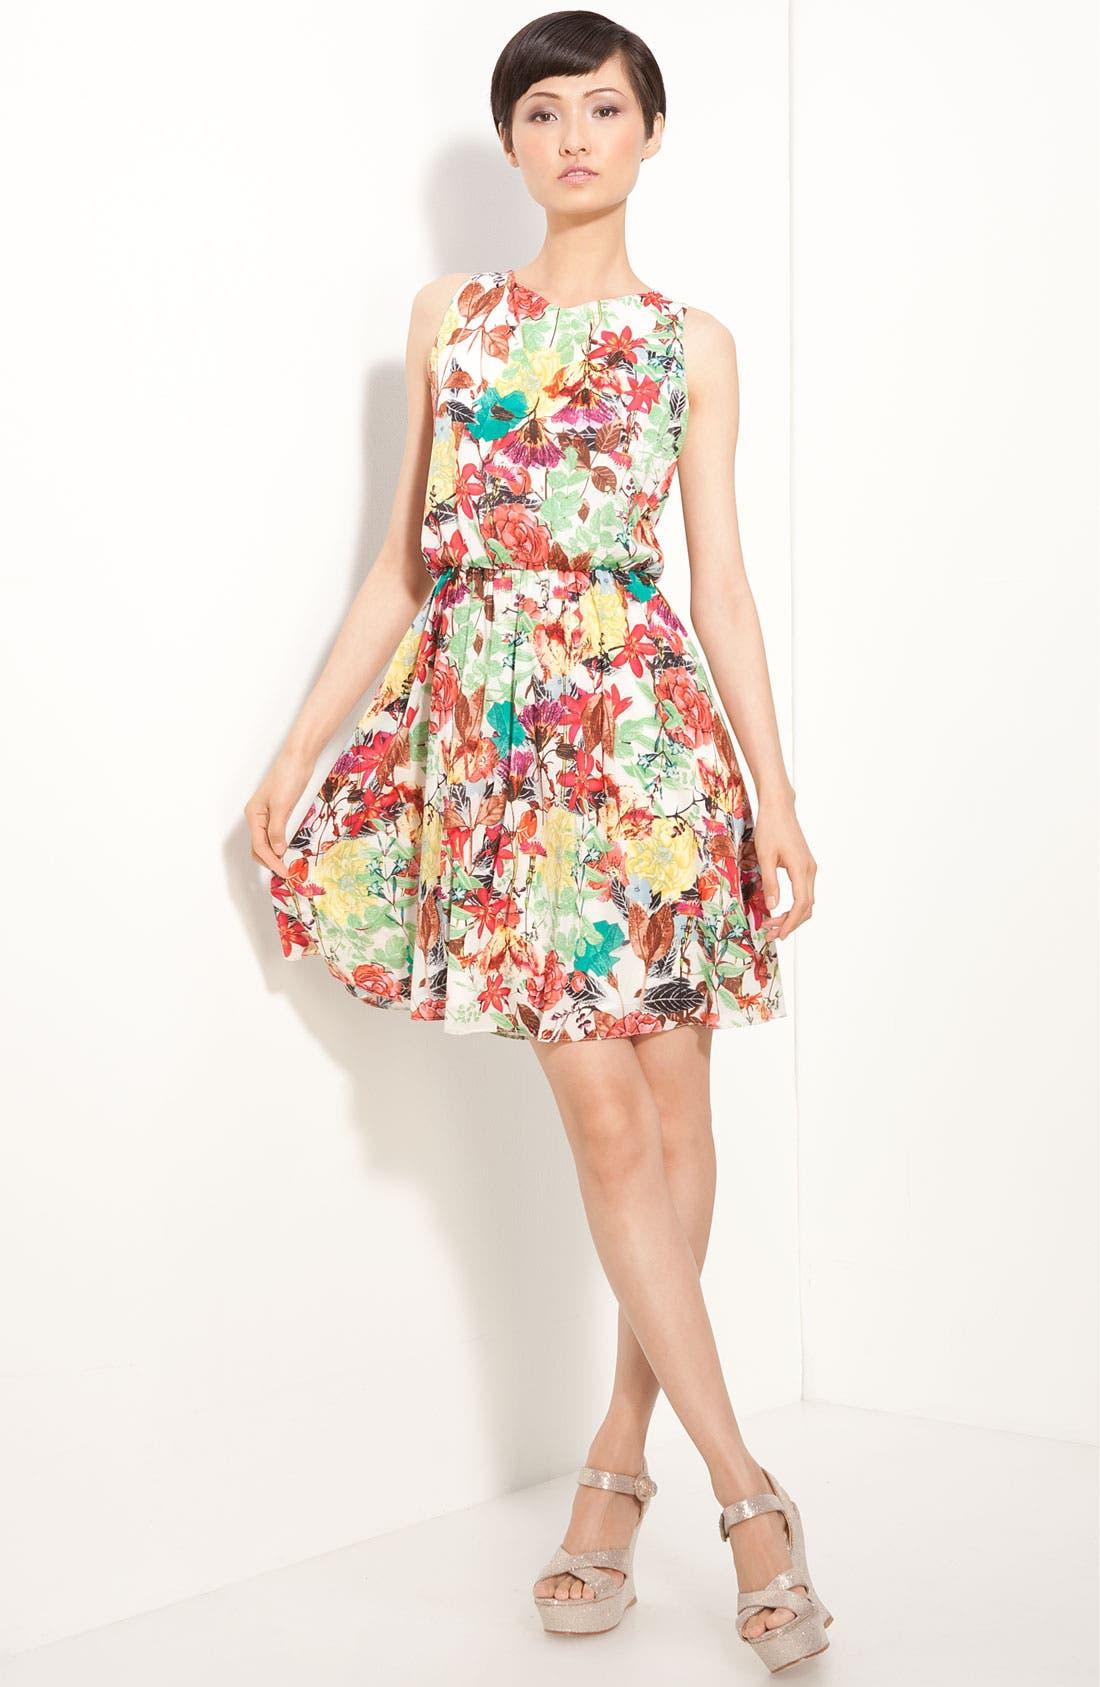 Alternate Image 1 Selected - Alice + Olivia 'Alina' Floral Print Dress